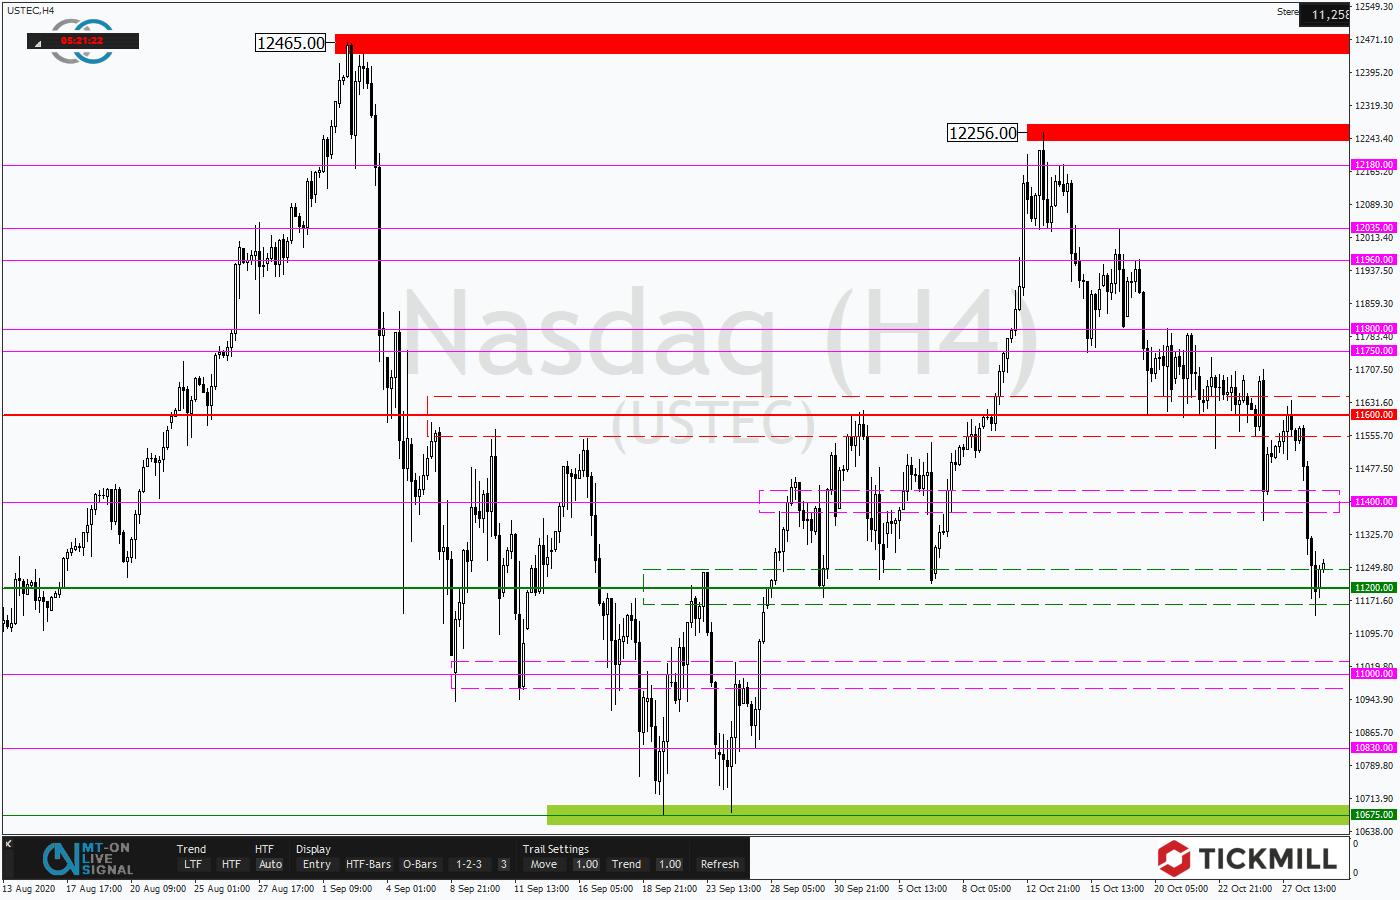 Tickmill-Analyse: Nasdaq 100 im 4-Stundenchart